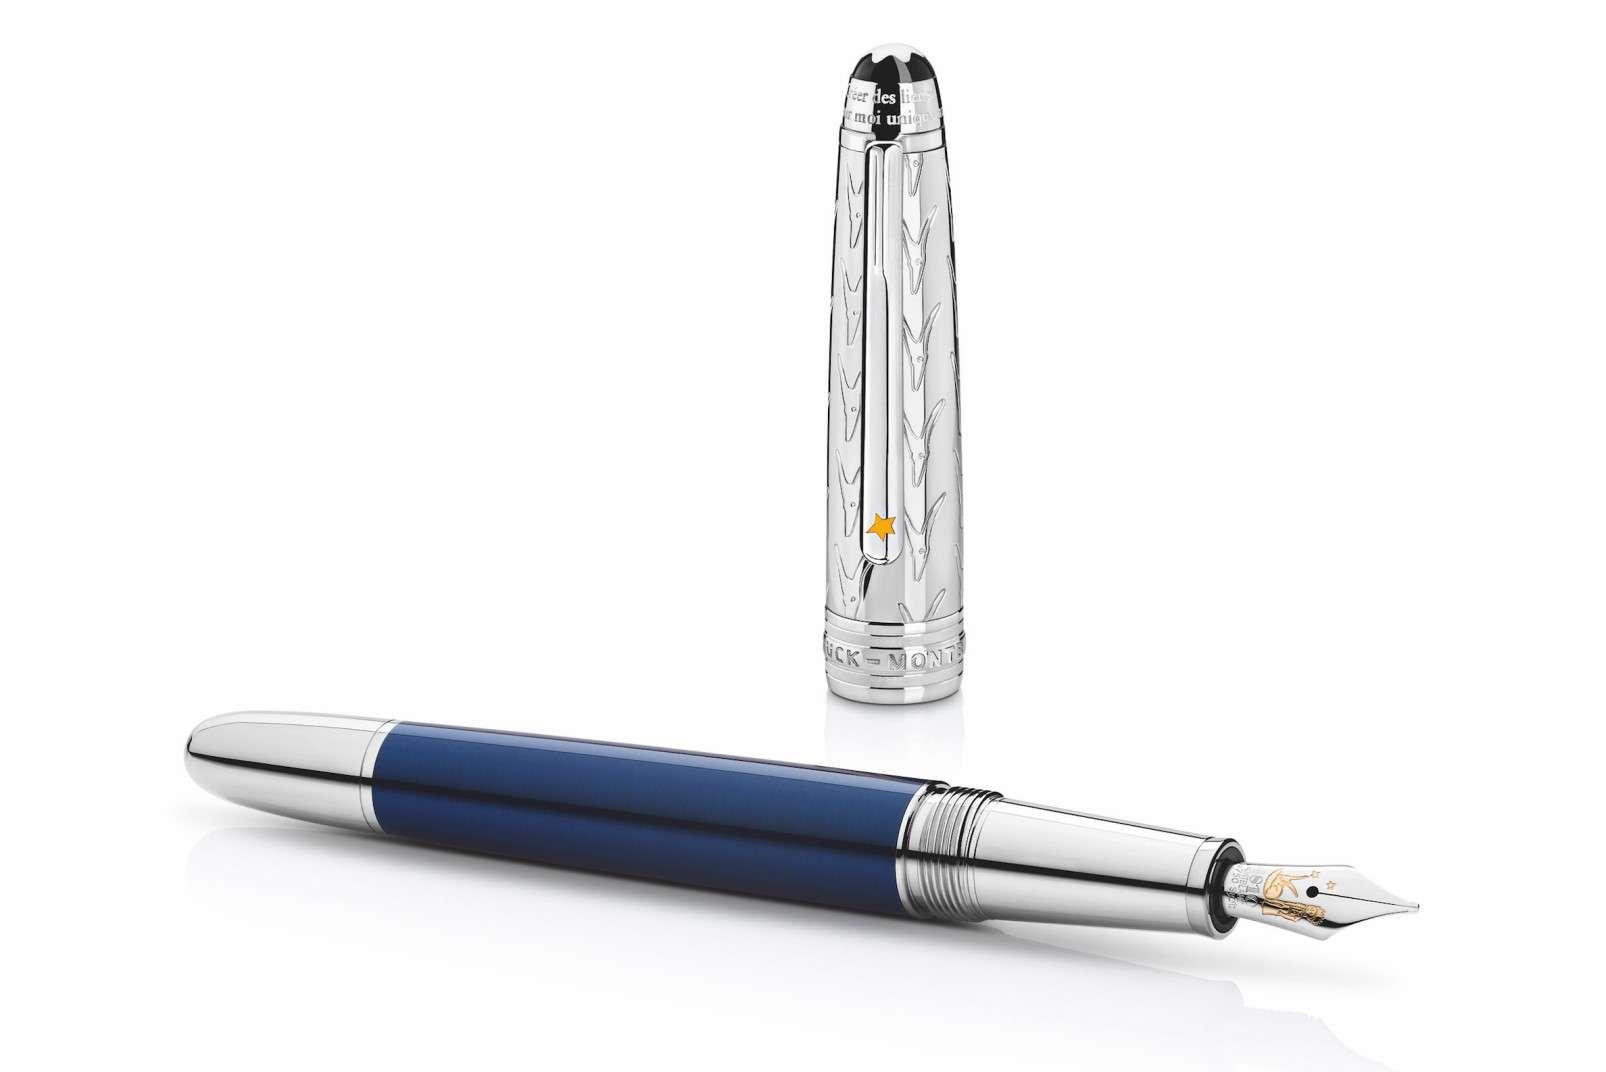 Montblanc Petit Prince fountain pen